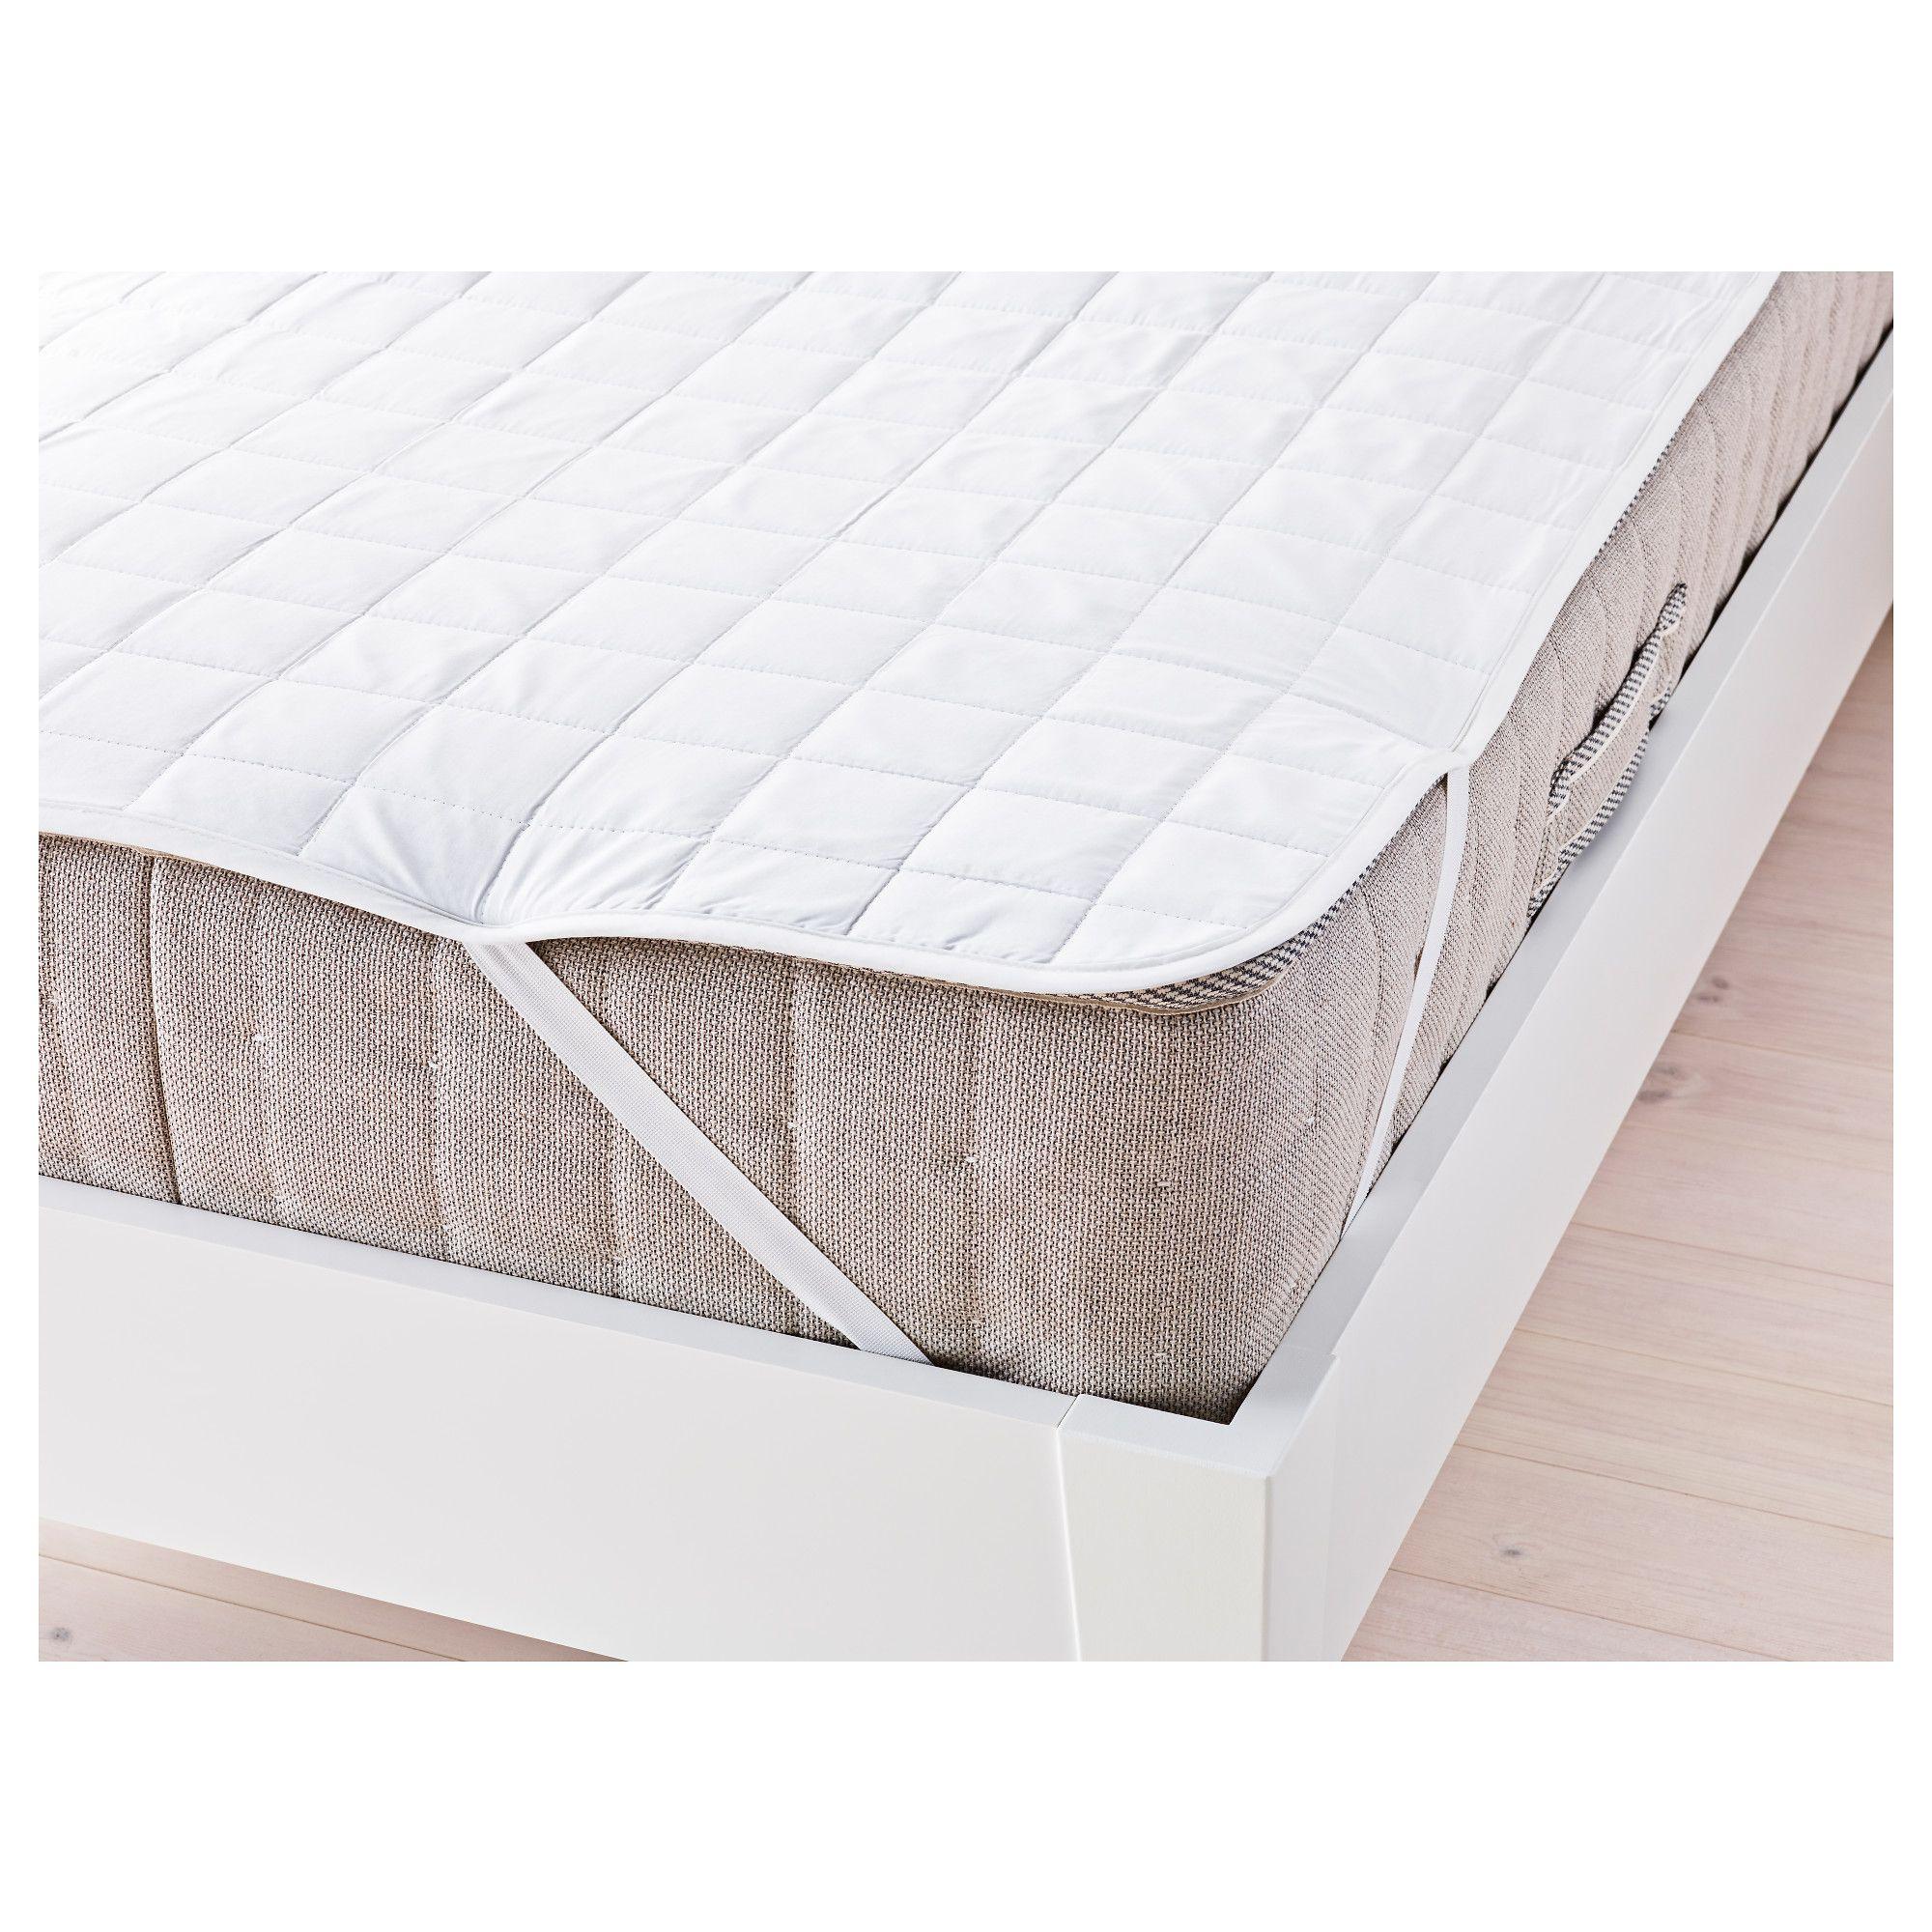 Ikea Us Furniture And Home Furnishings Mattress Ikea Mattress Mattress Protector